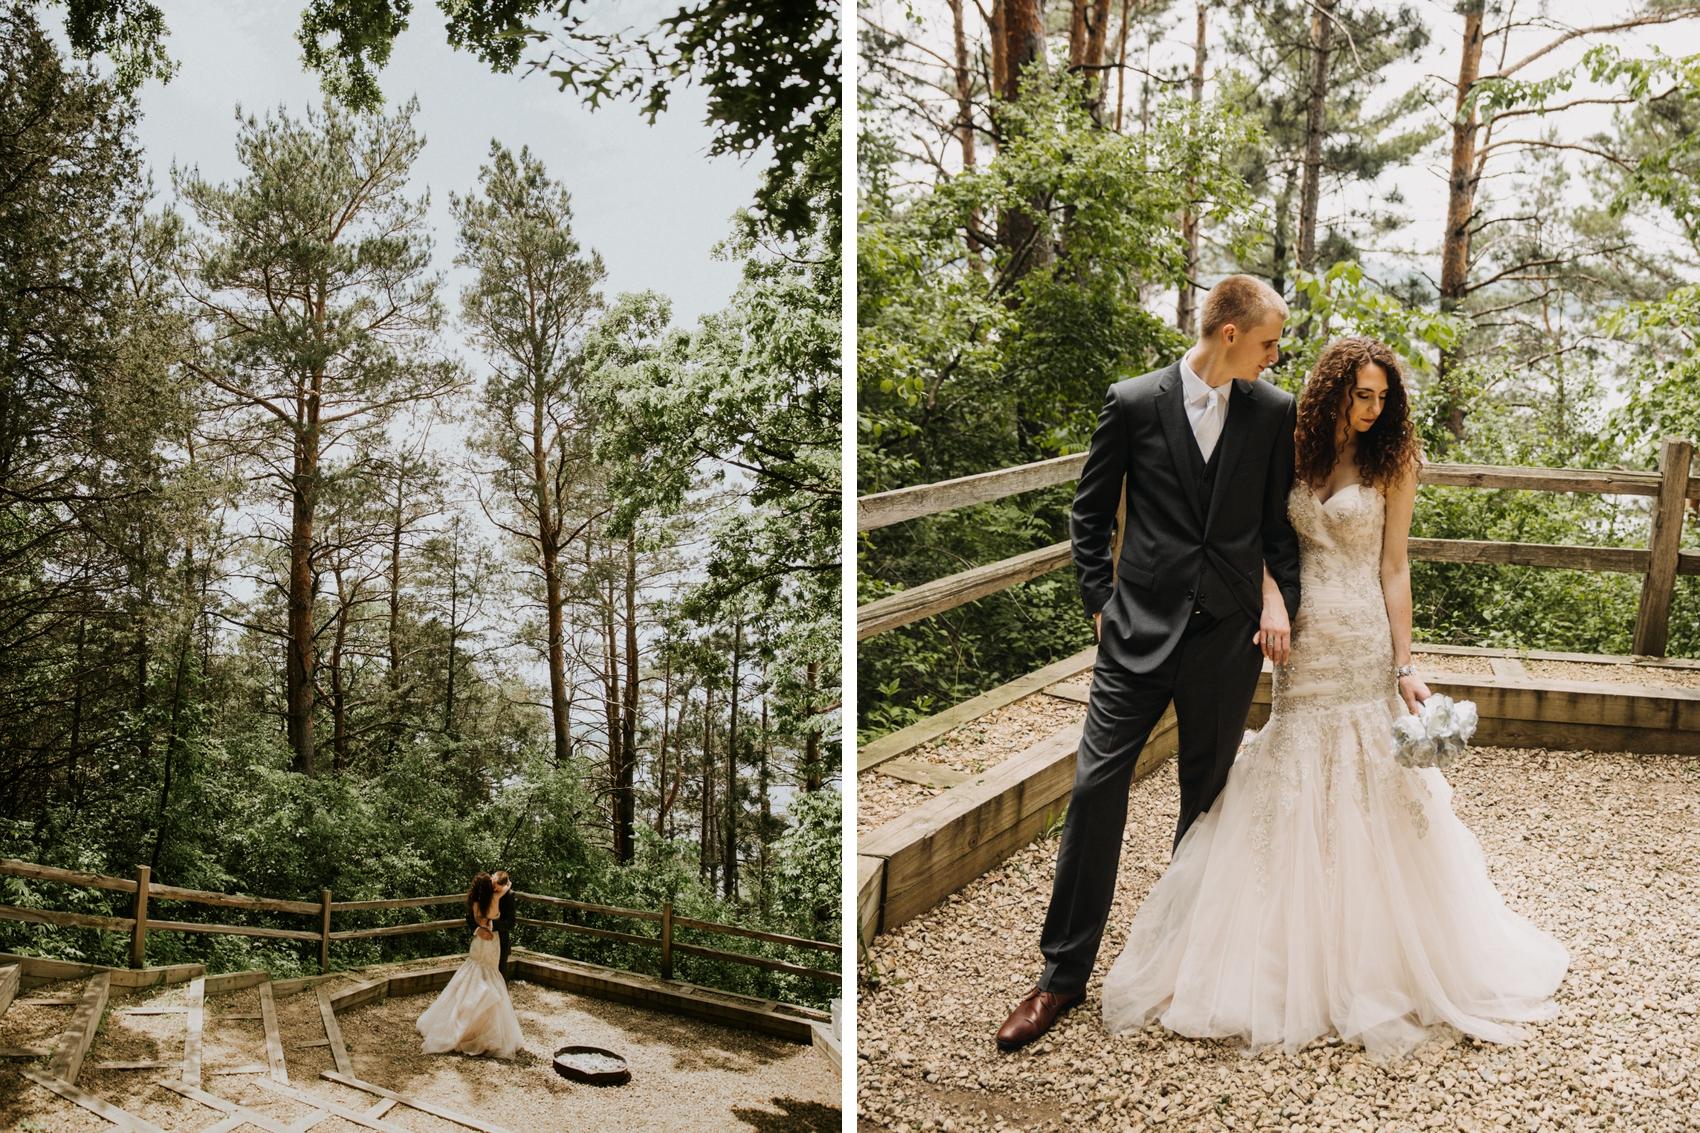 camp-site-wedding-bride-groom-portraits.jpg